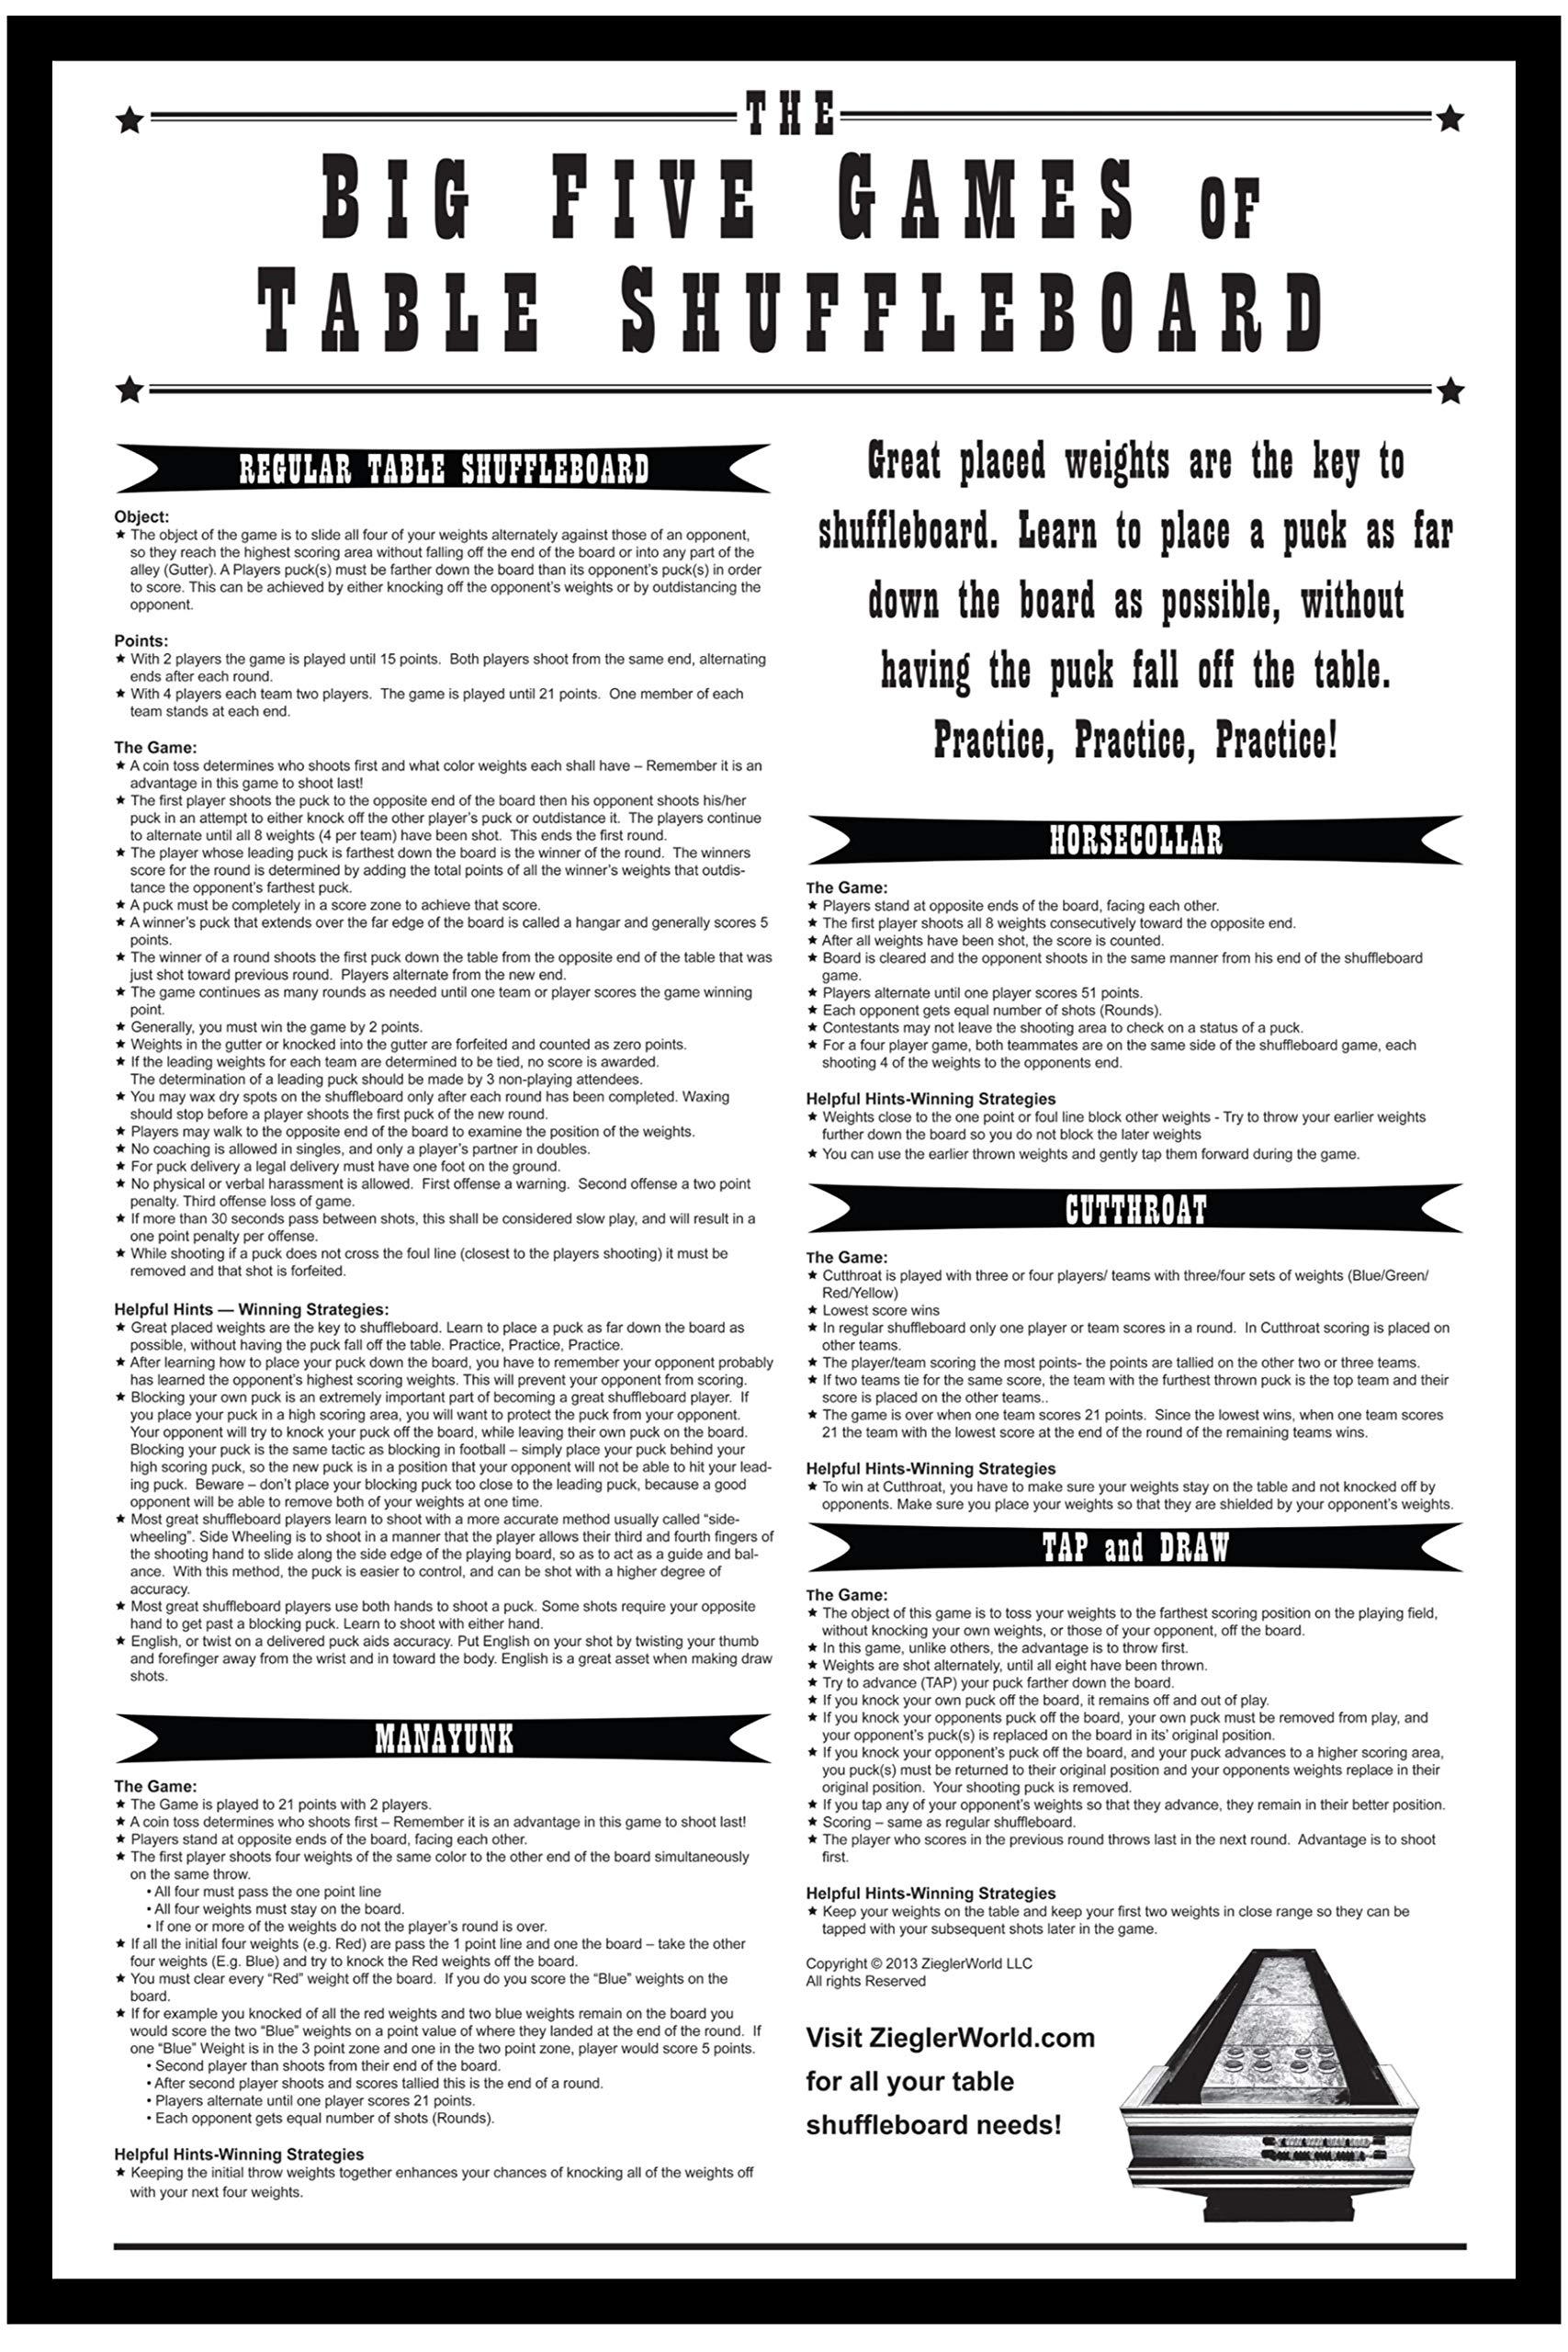 ZieglerWorld Framed 18 x 12 Big Five Games of Table Shuffleboard Rules Print by ZieglerWorld